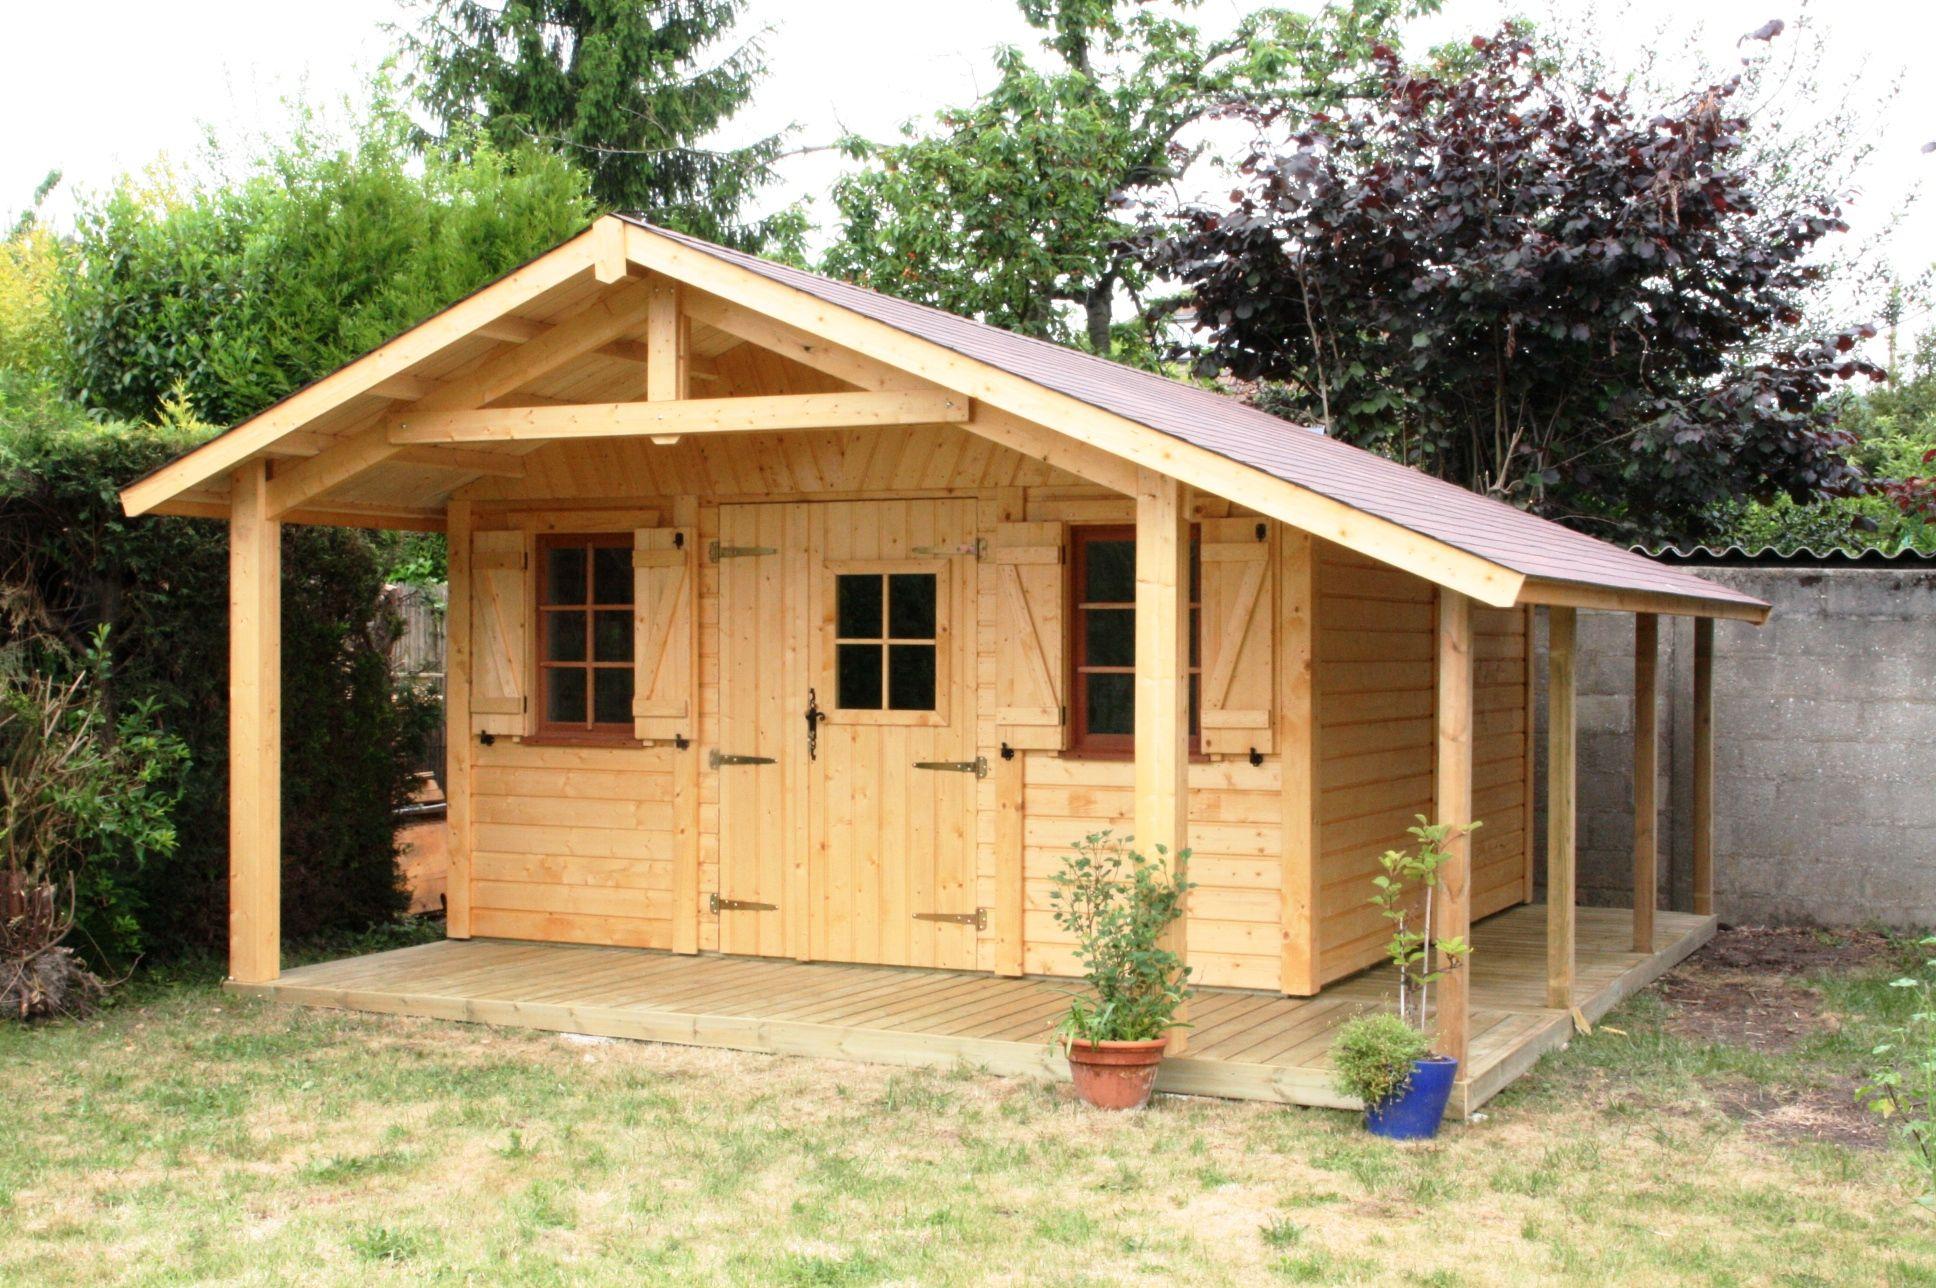 abri de jardin en bois milly avec b cher et. Black Bedroom Furniture Sets. Home Design Ideas